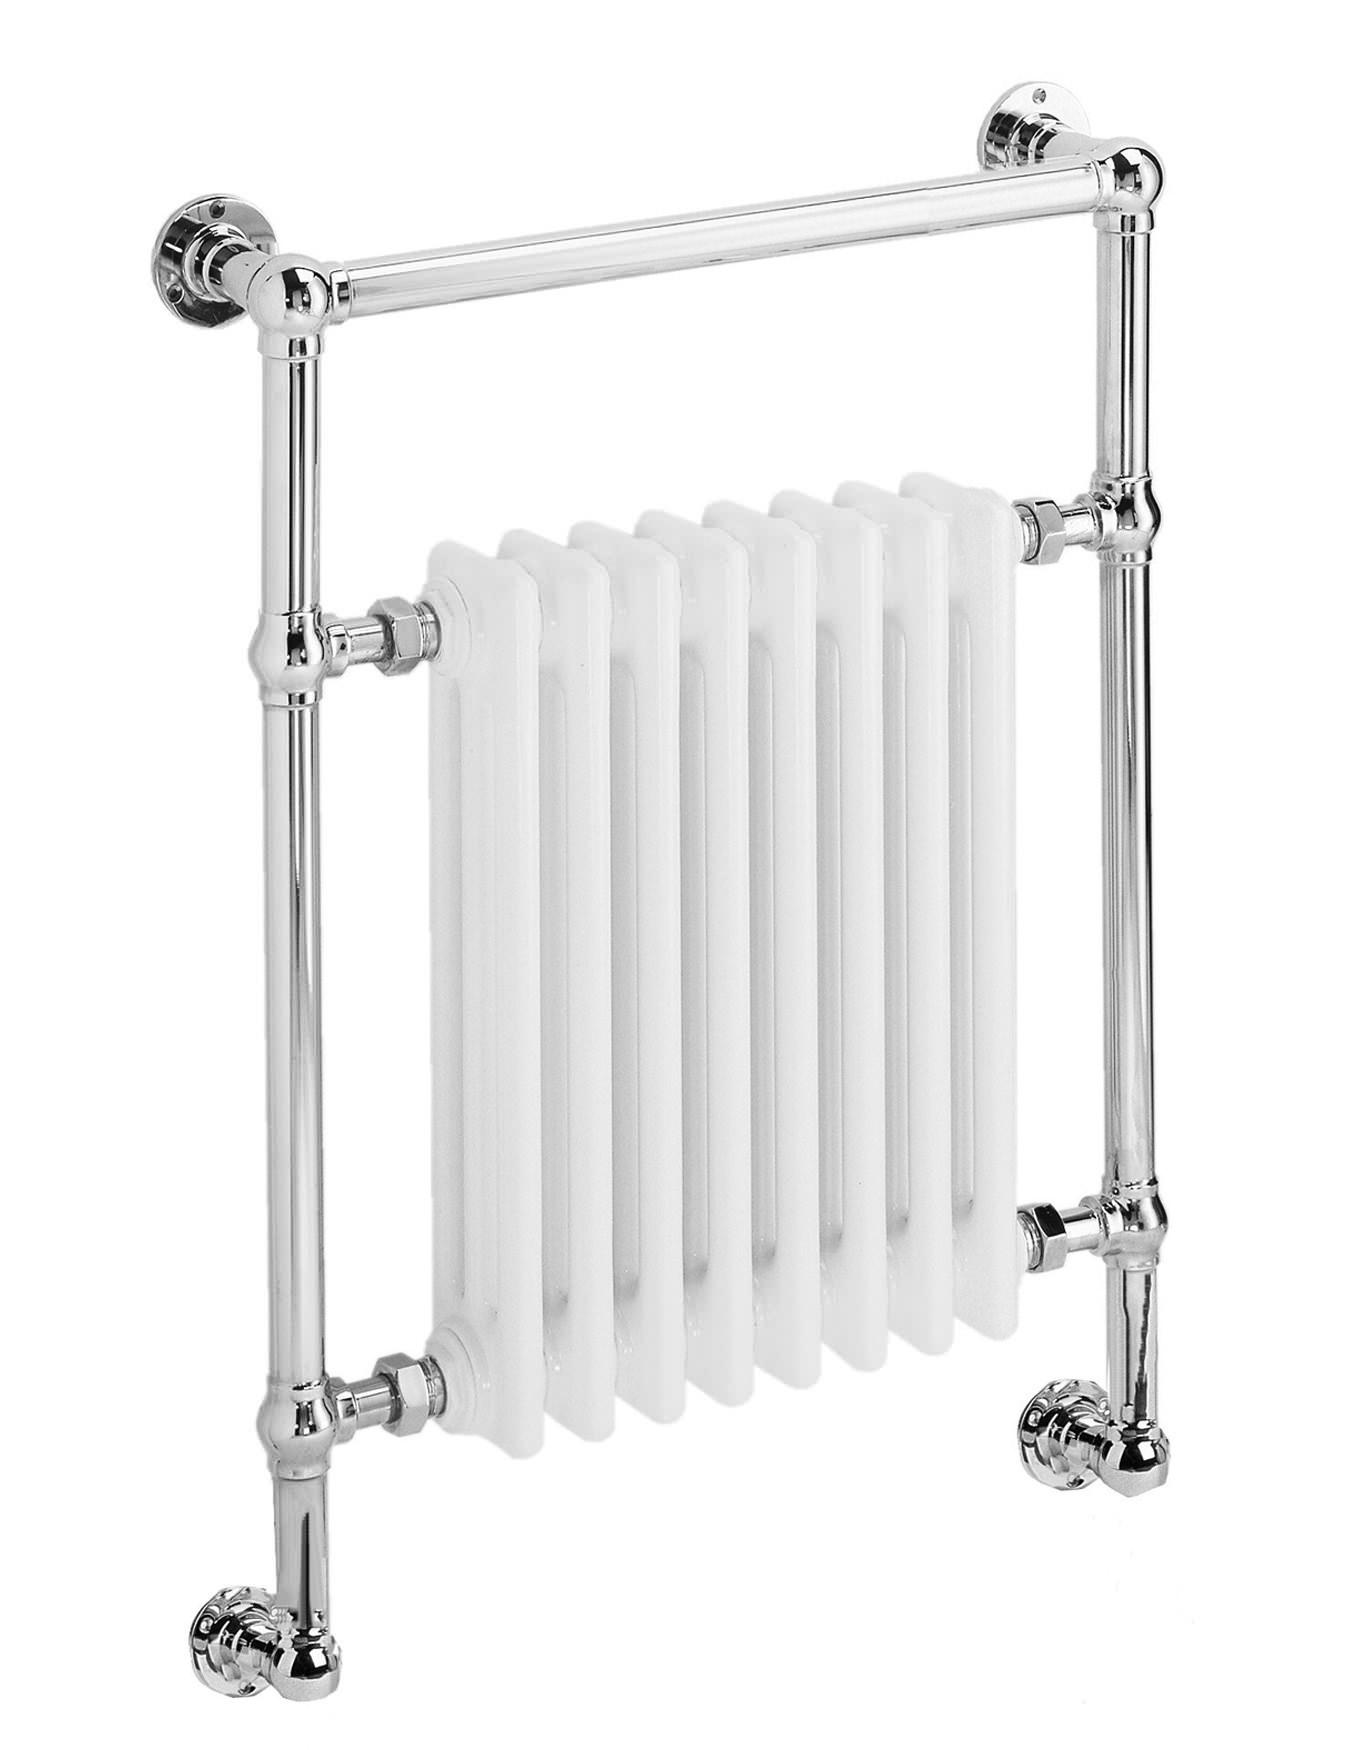 dq heating lynford wall mounted chrome towel rail 509 x. Black Bedroom Furniture Sets. Home Design Ideas